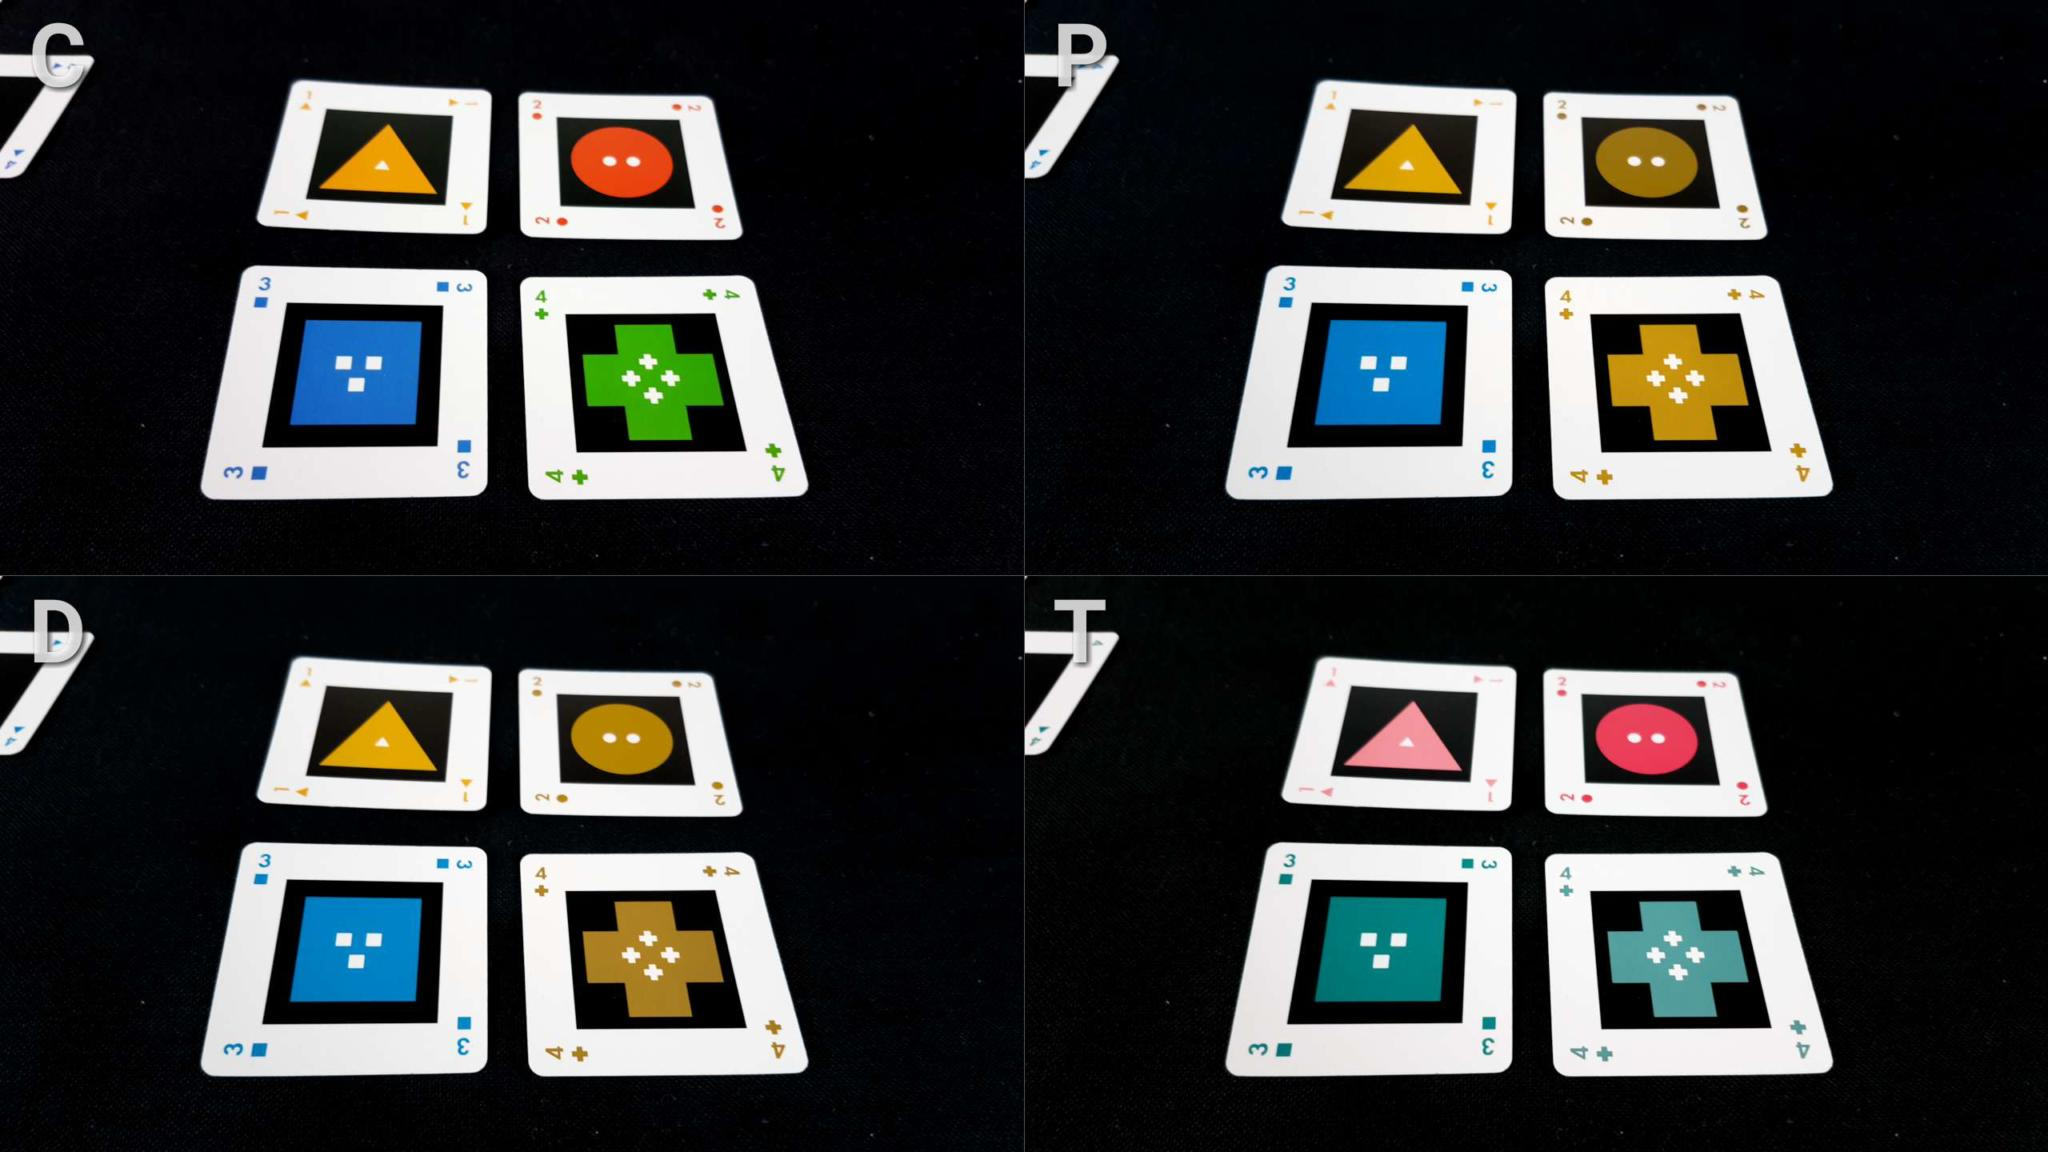 Colour blindness cards